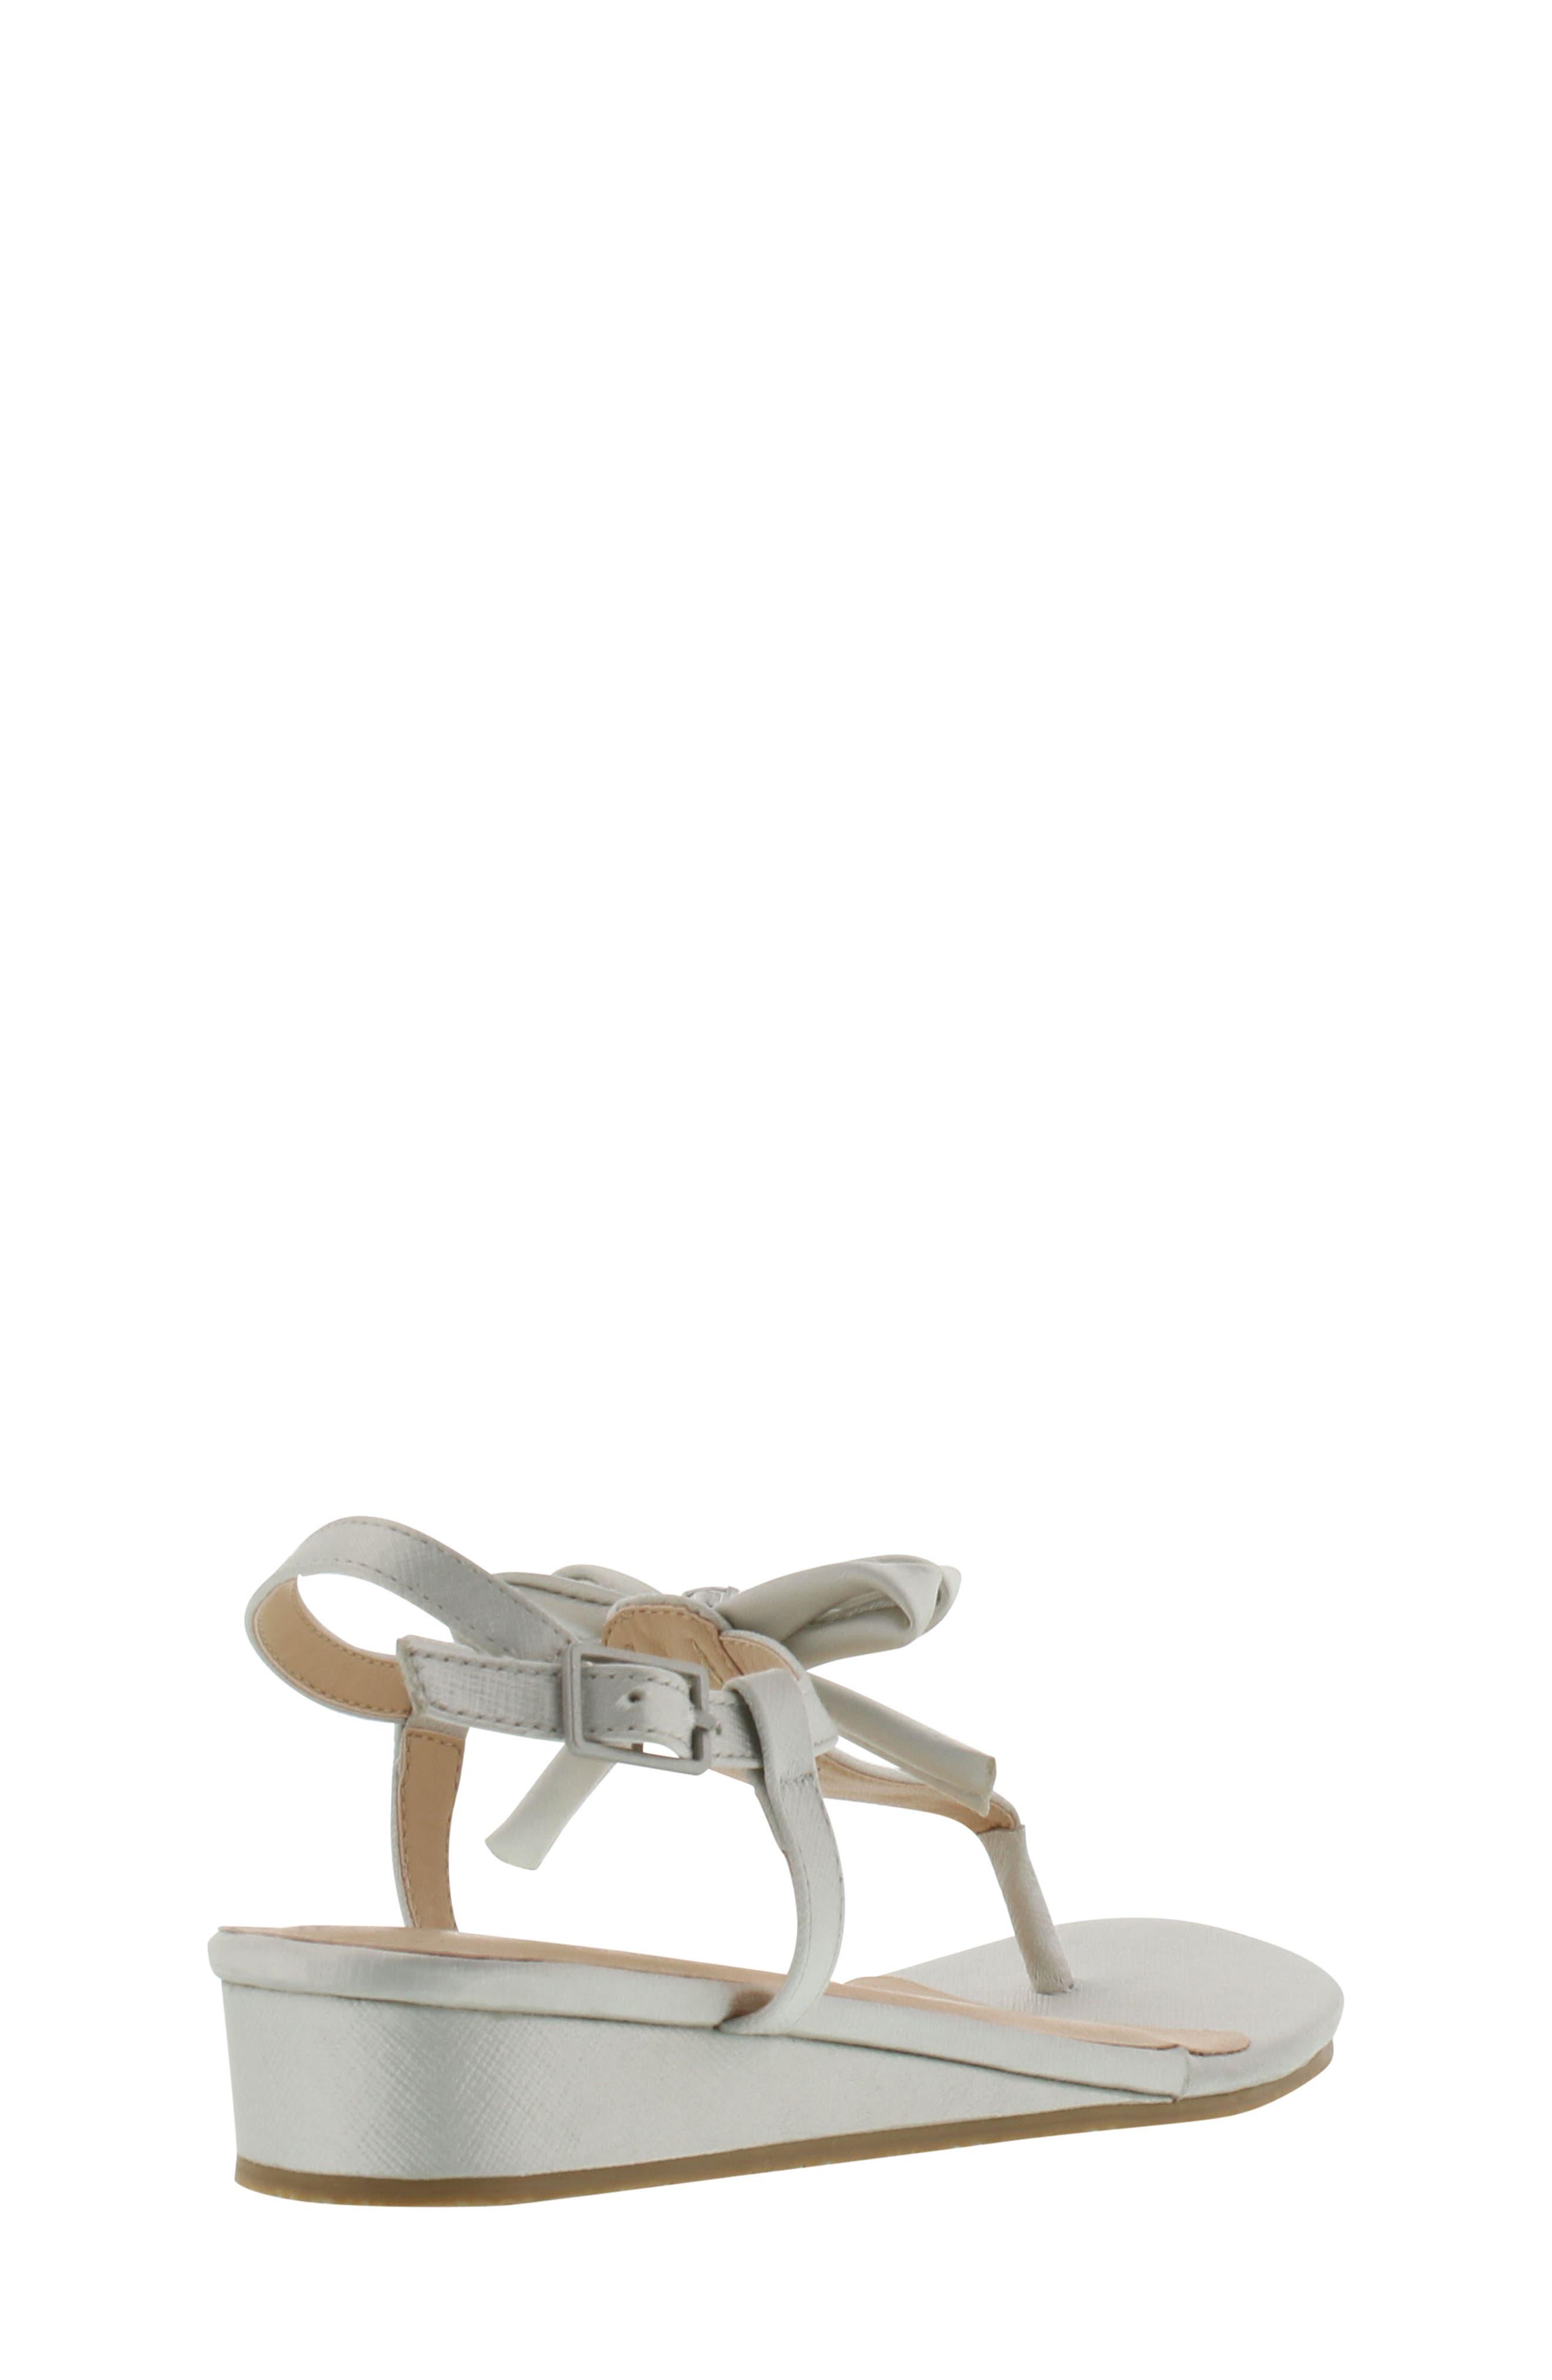 Talia Embellished Bow Sandal,                             Alternate thumbnail 2, color,                             040